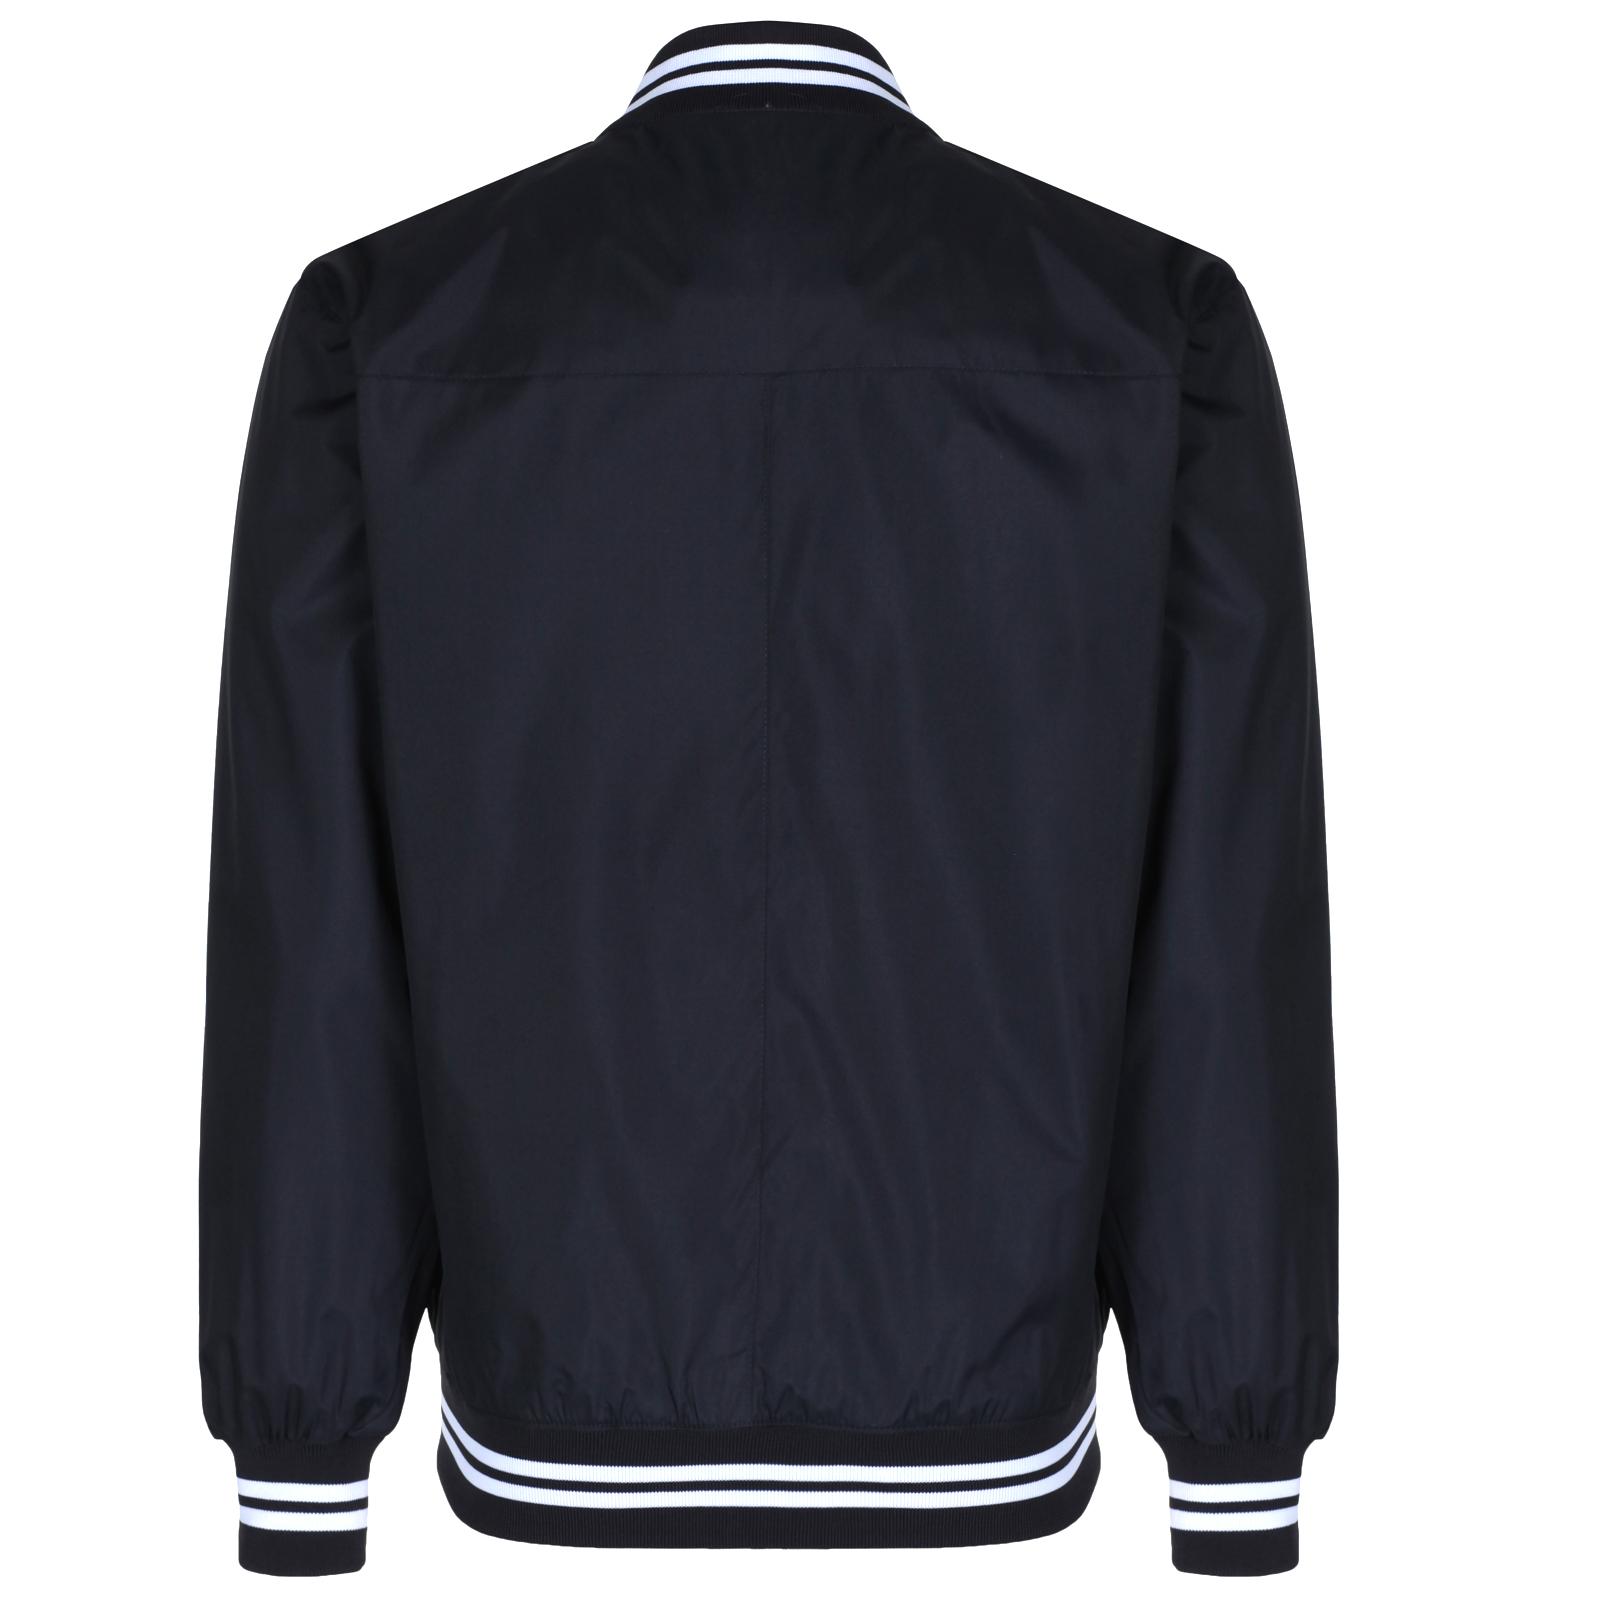 Soul Star Mens Retro Bomber Jacket Varsity College Coat Track Top